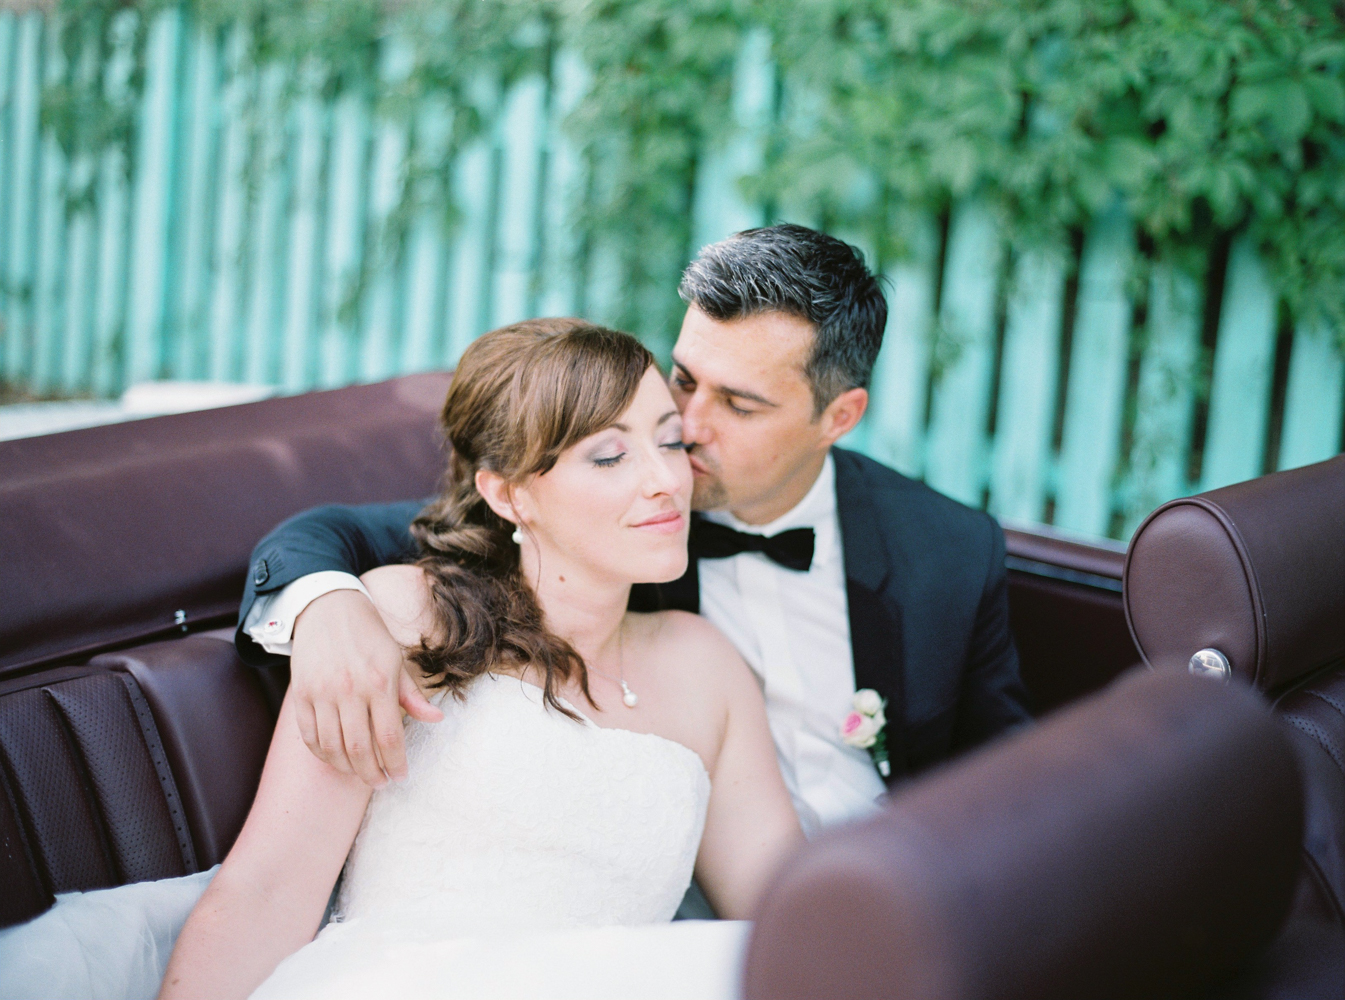 Hochzeitsfotograf_Stuttgart_Karoline_Kirchhof.jpg